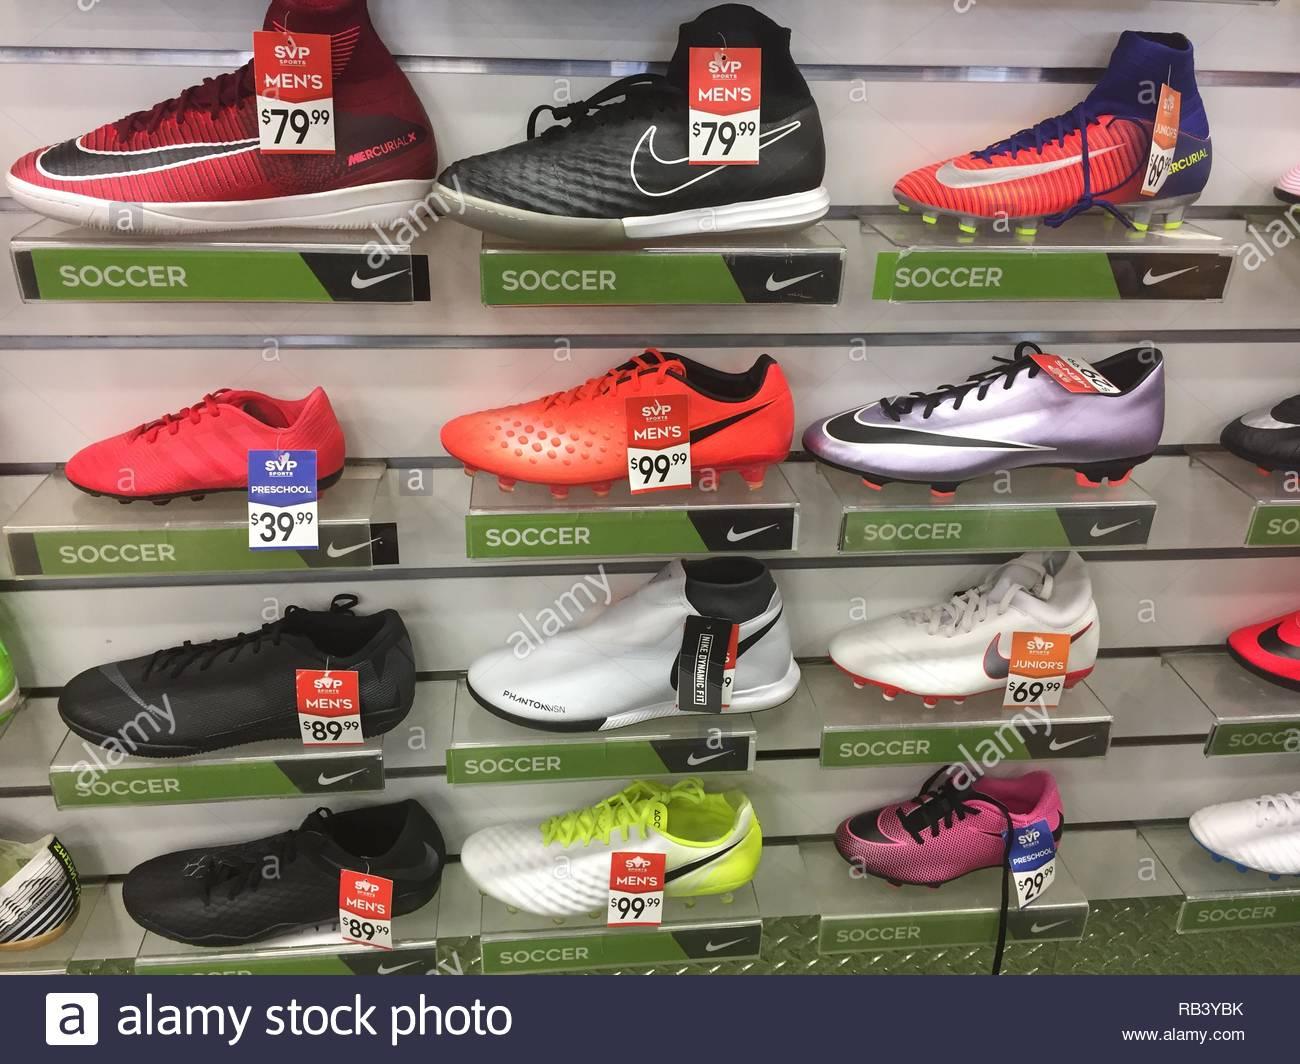 Football Shoes Imágenes De Stock   Football Shoes Fotos De Stock ... a34487389227b